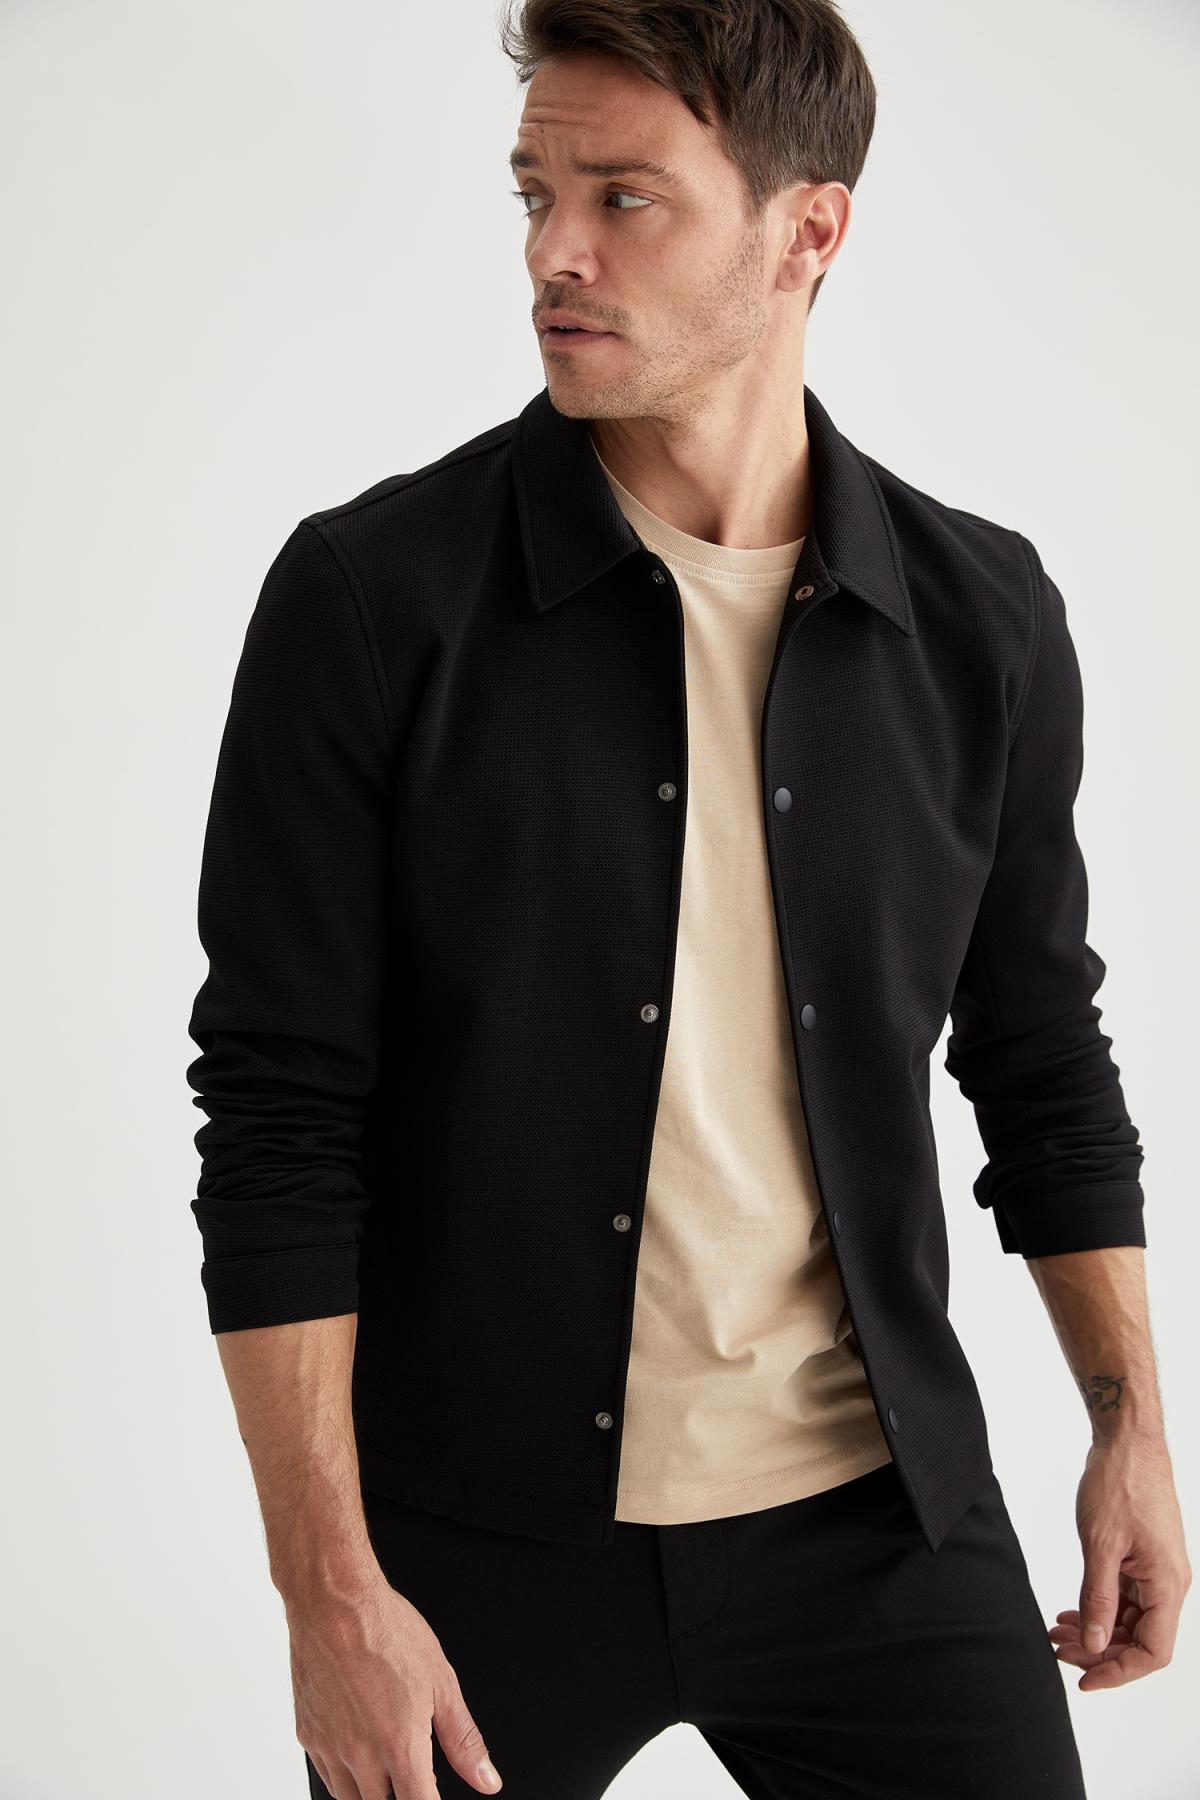 DeFacto Spring Man Coats & Jackets Regular Fit Basic Shirt Jacket Outerwear Warm Fashion New Season-